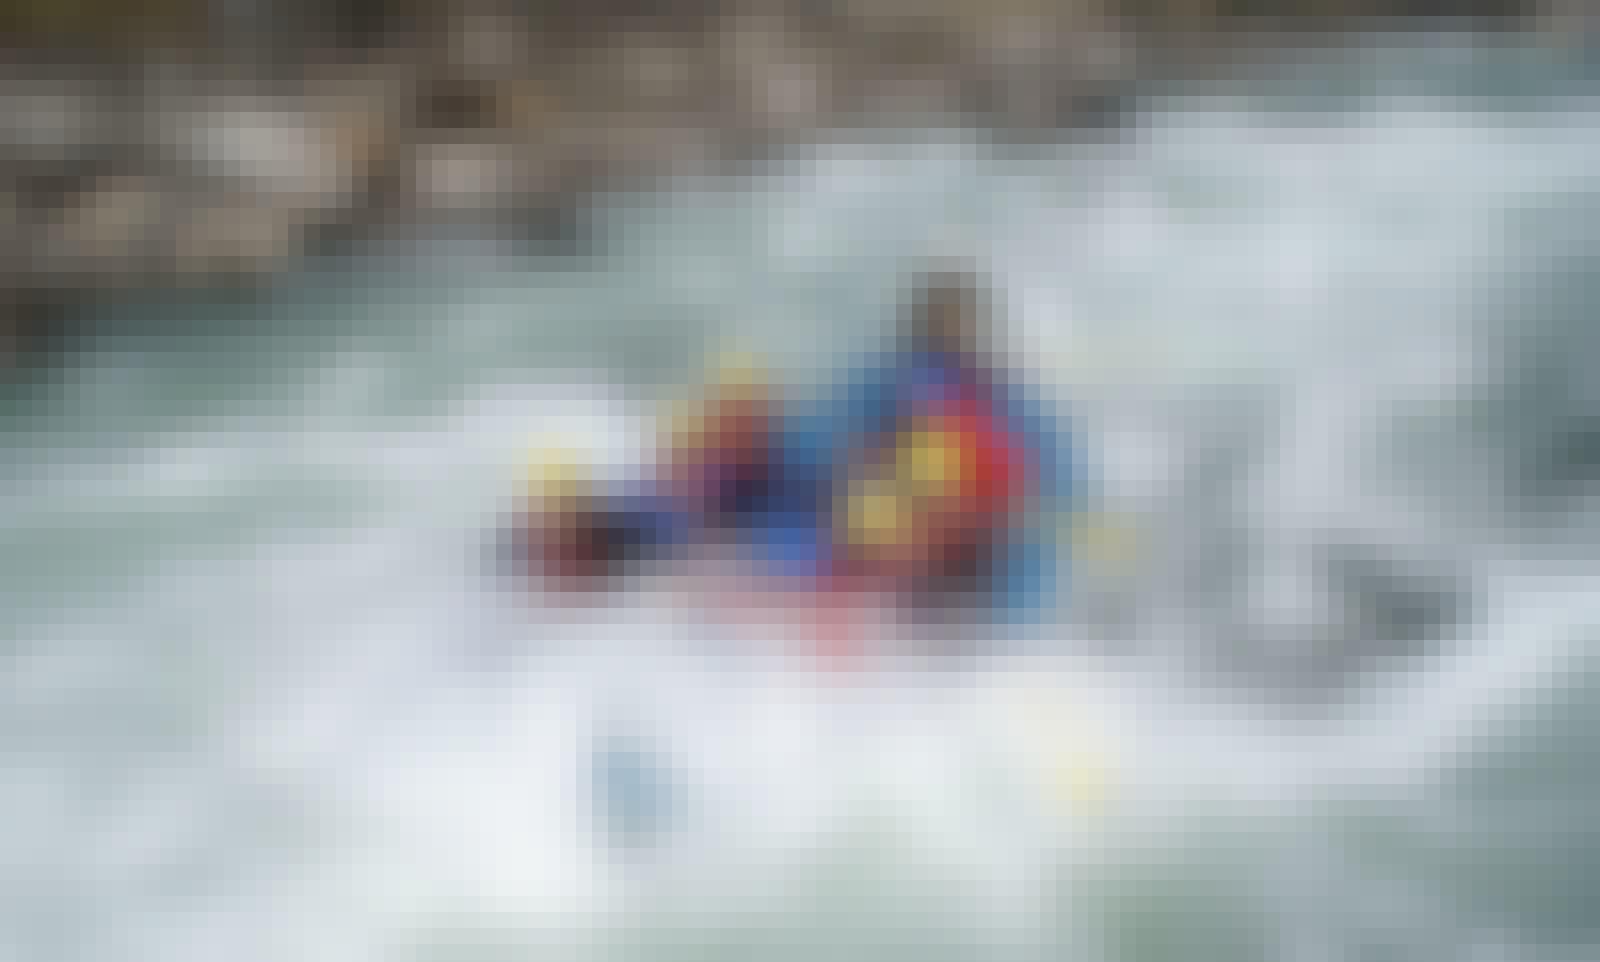 Raft Rental in kathamandu, Nepal